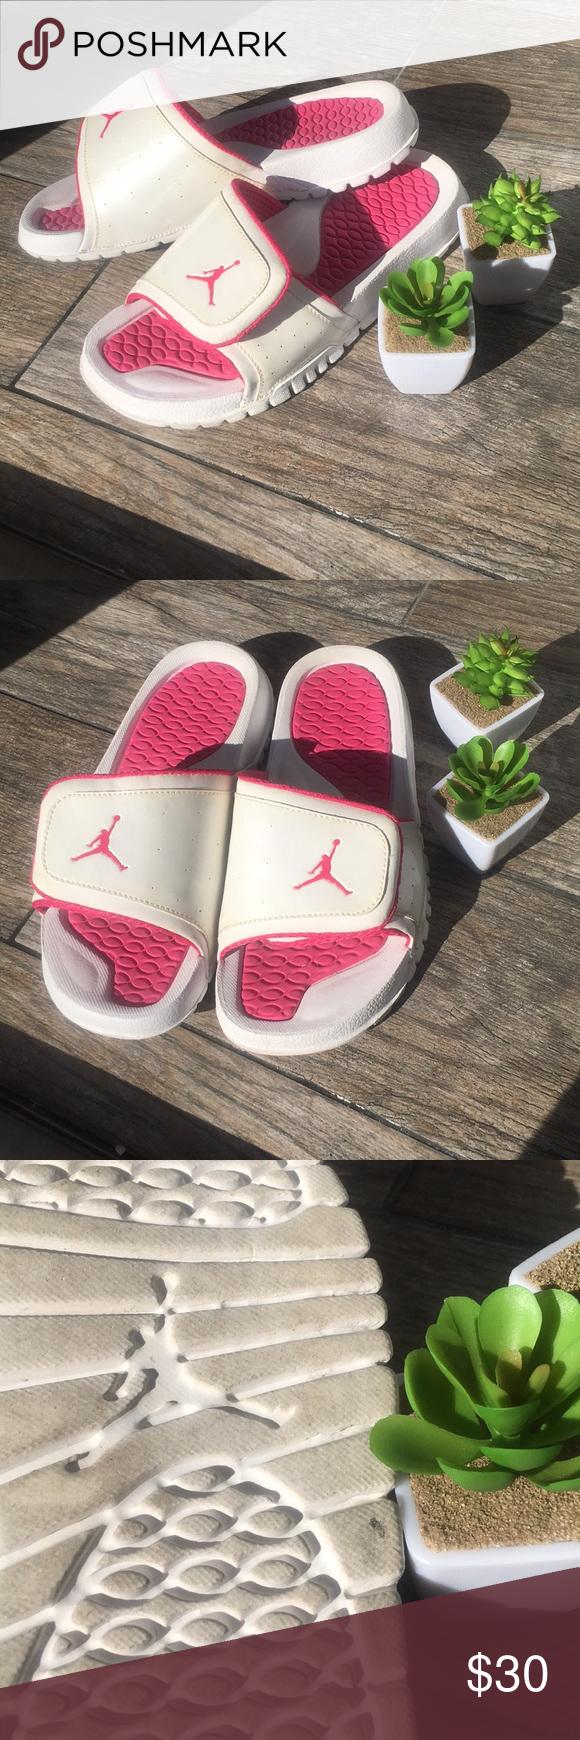 c4610bffa9508d Women s Air Jordan sandals Pink and white Air Jordan sandals. Size six